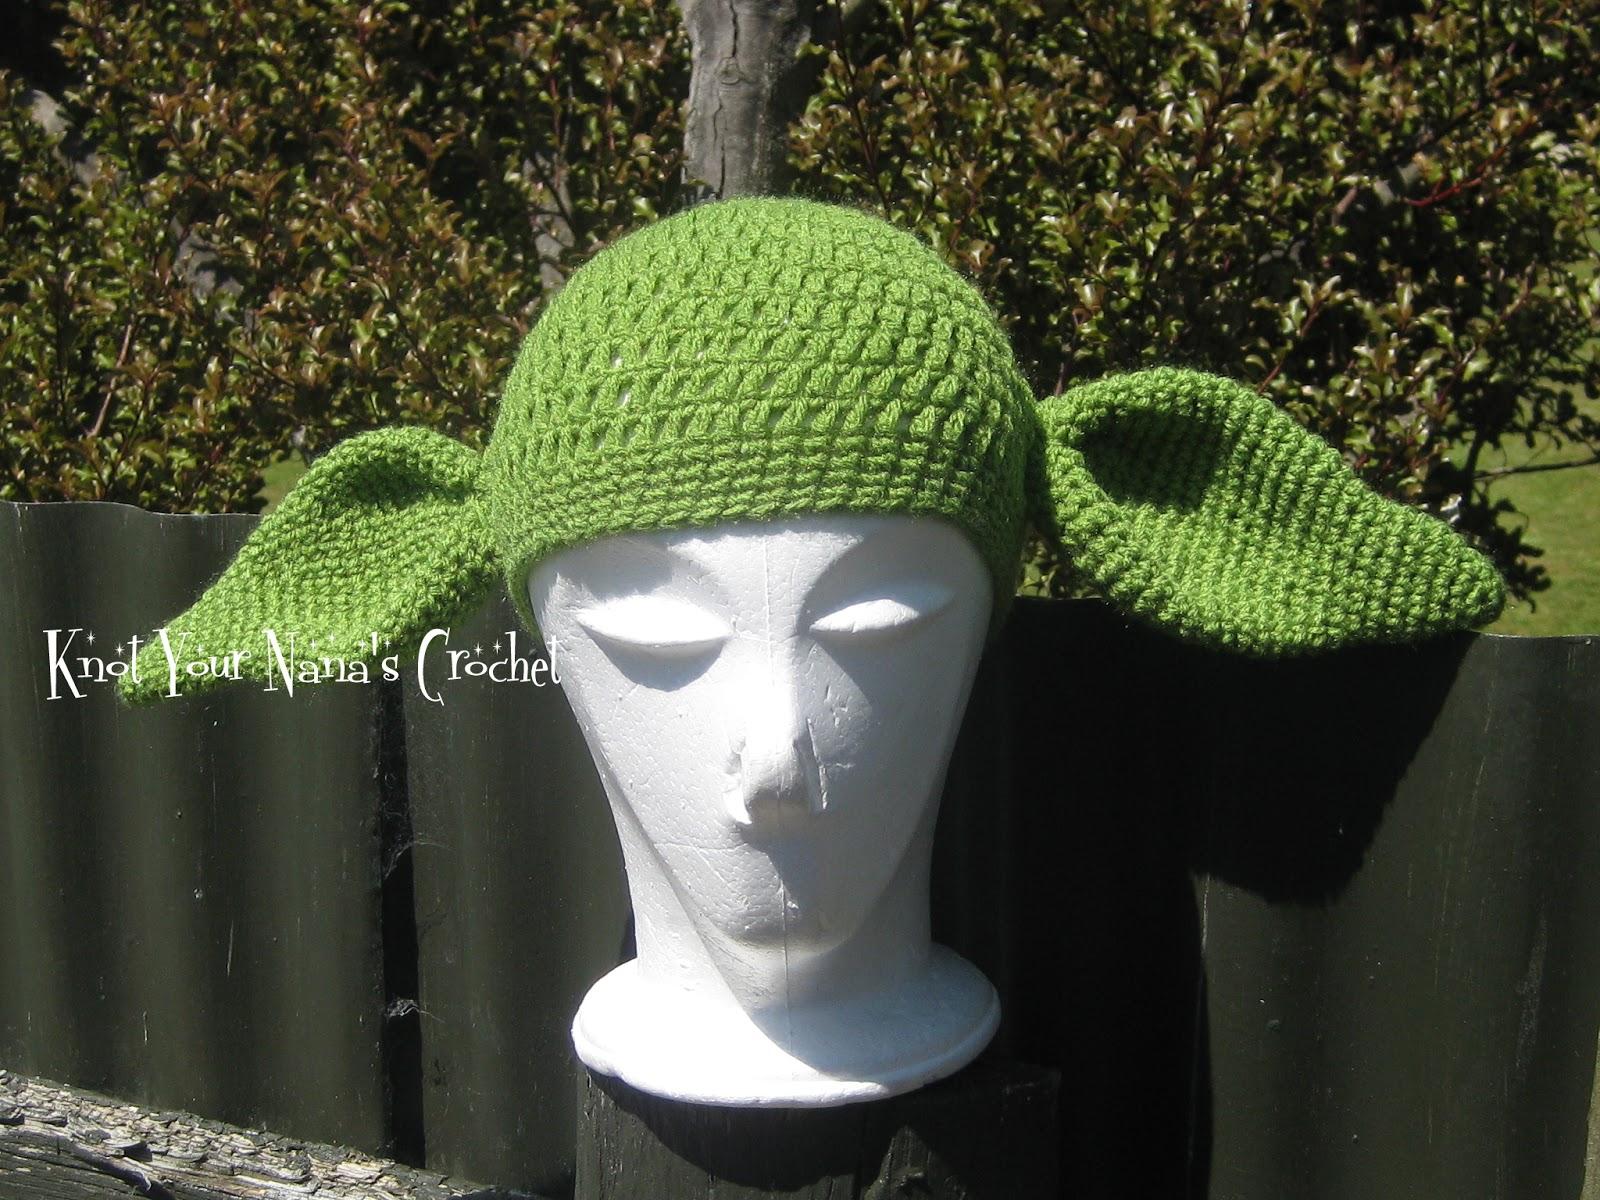 Knot Your Nana s Crochet  Crochet Yoda Hat 3e8fe79d71f